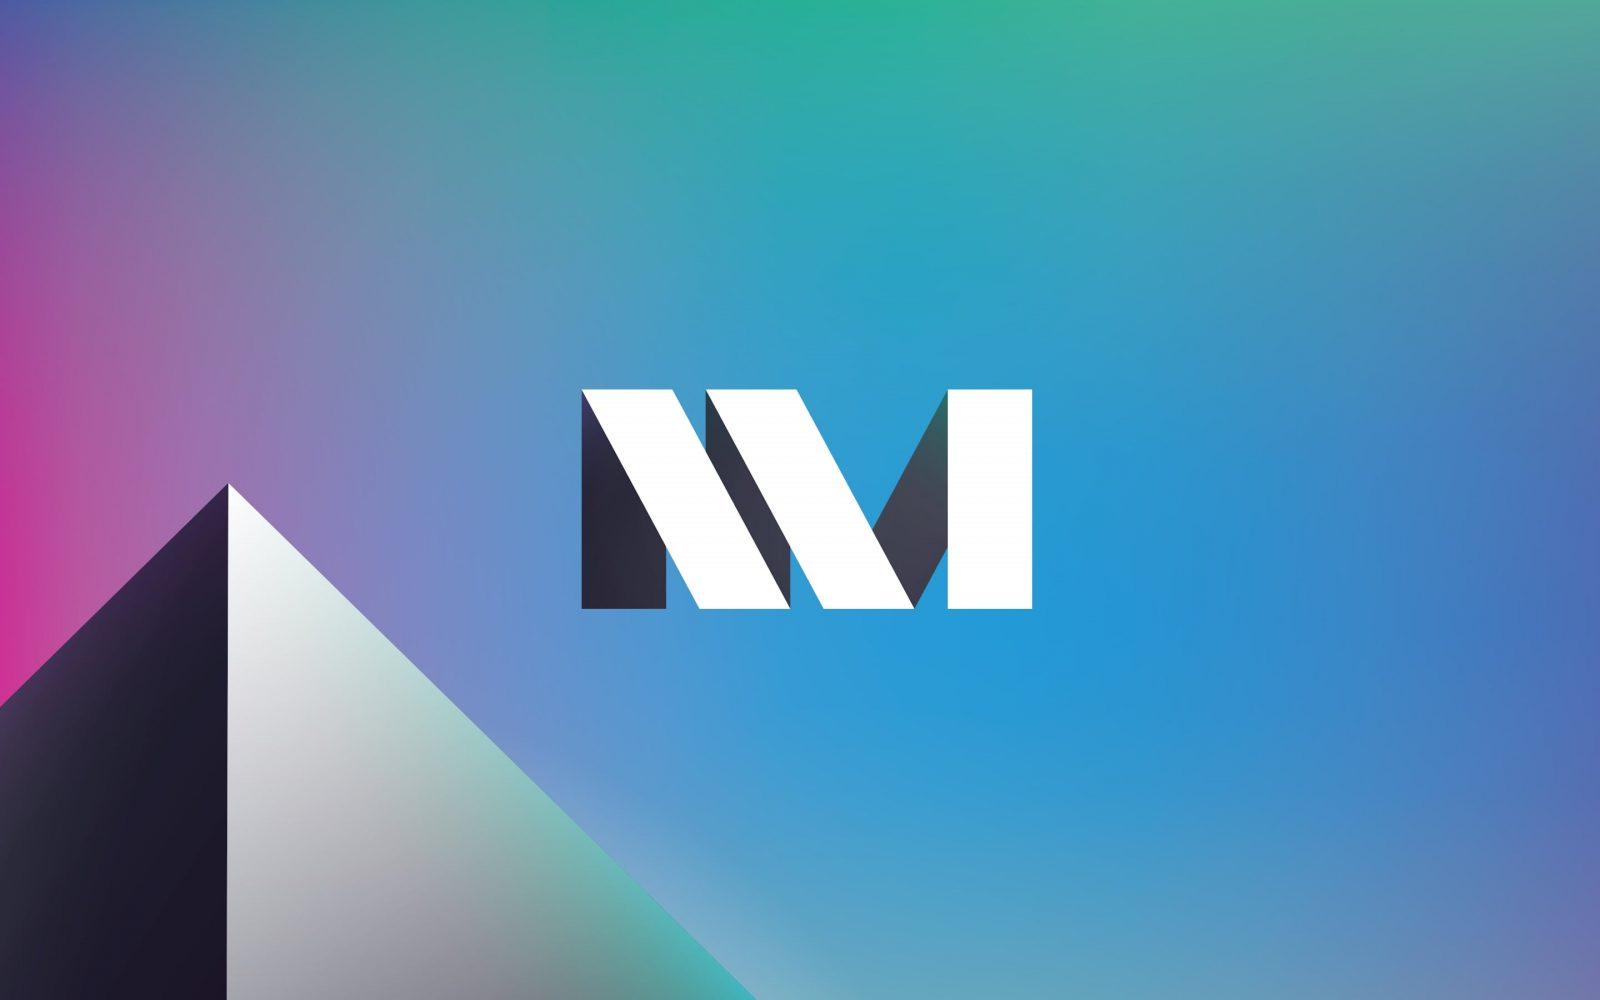 Nenad Milosevic's logo.